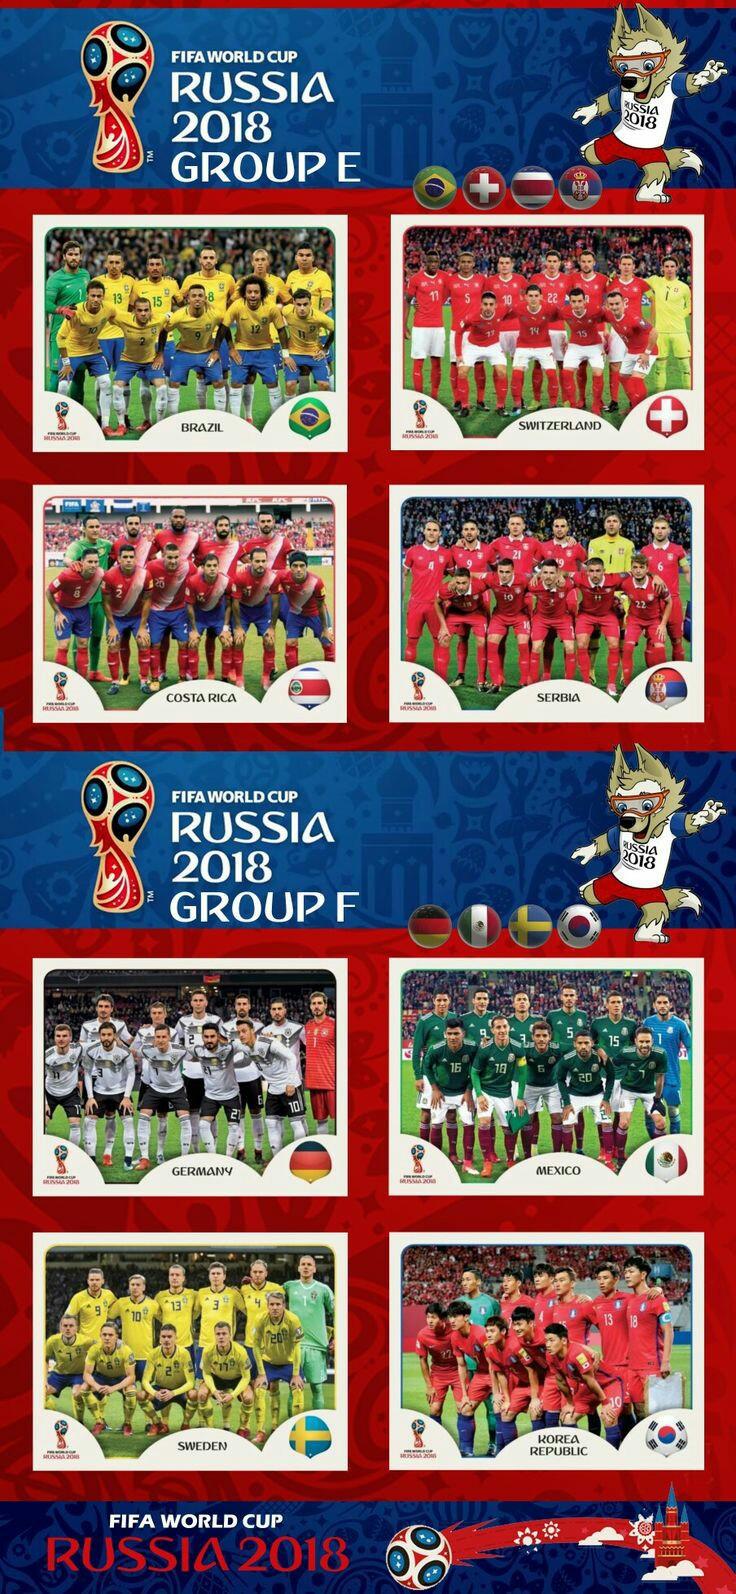 Grupos E y F - Rusia 2018